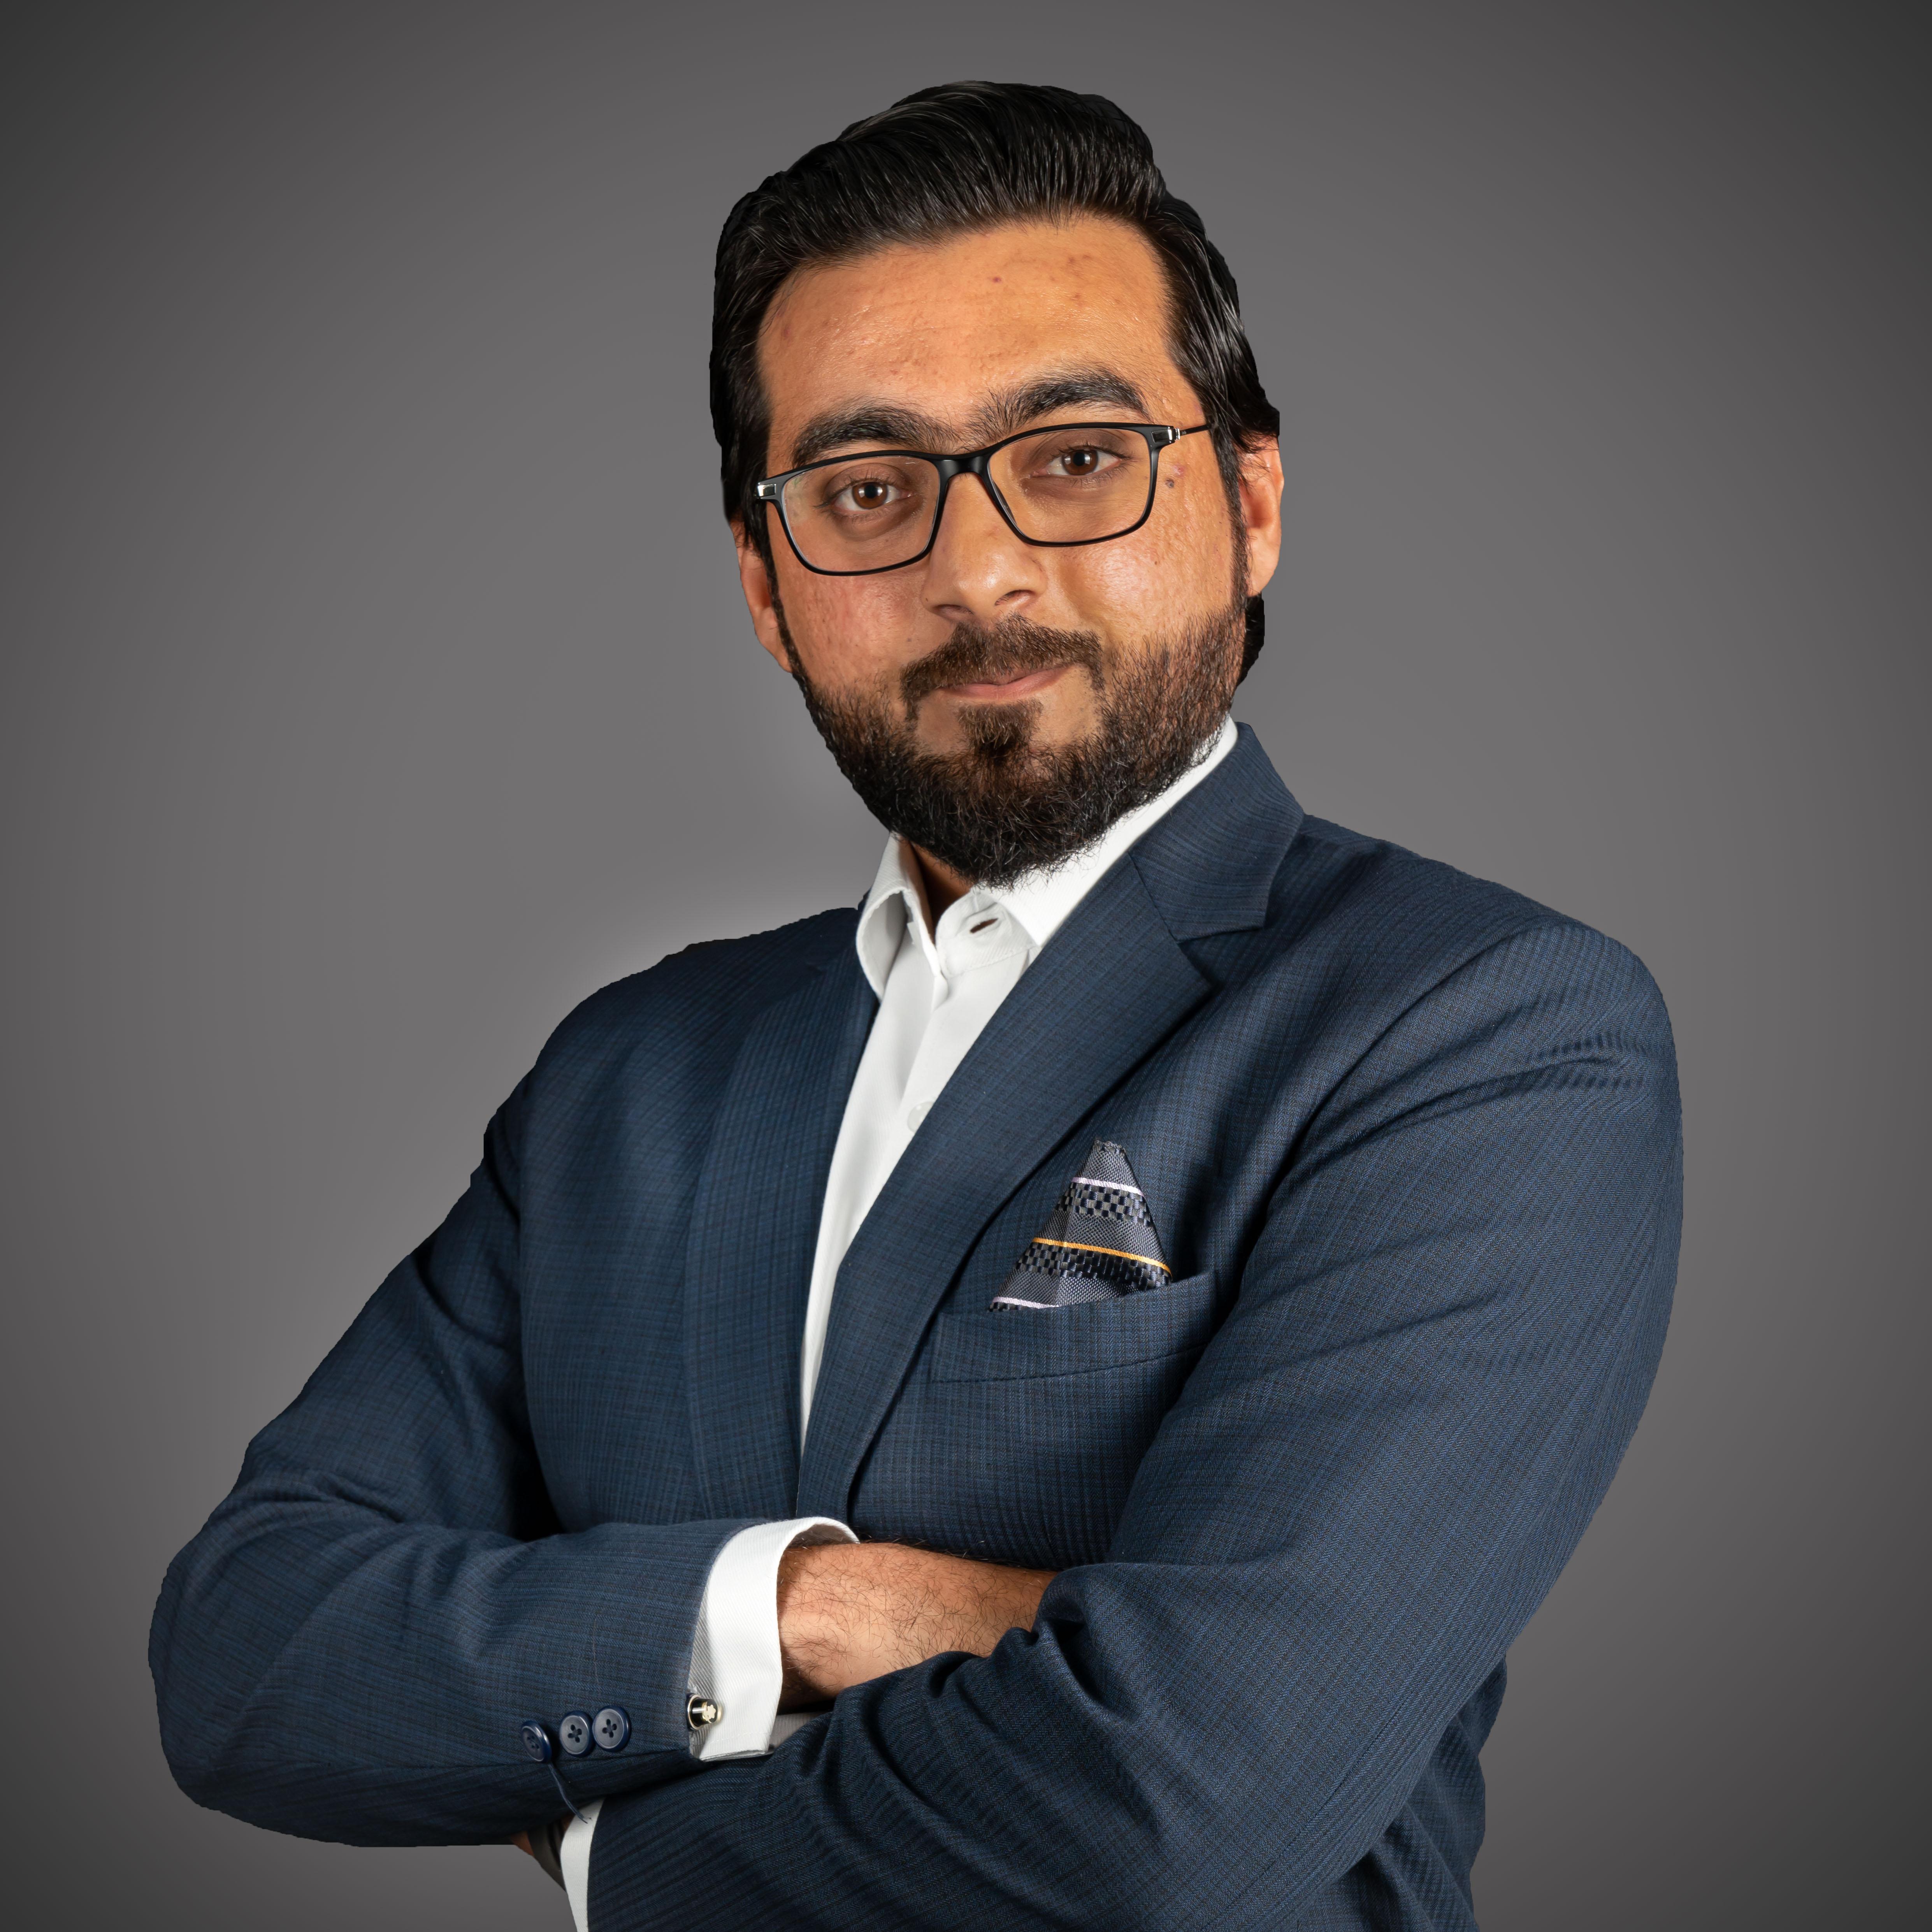 Mubeen Imtiaz Ali